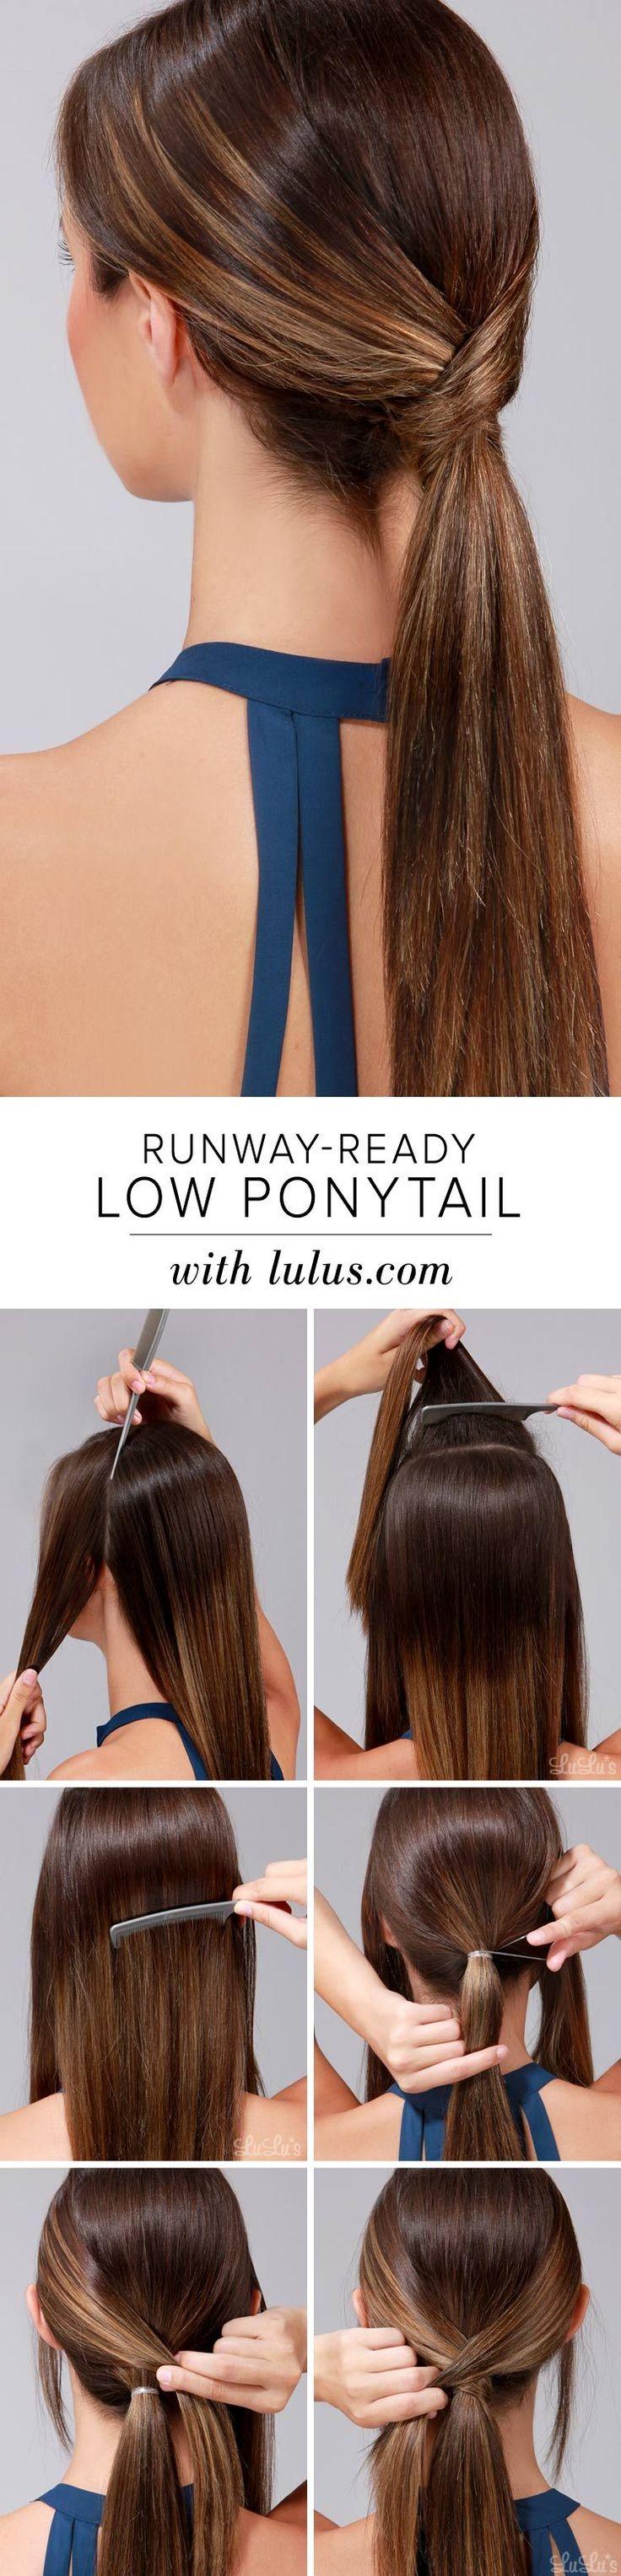 Wondrous 1000 Ideas About Easy Professional Hairstyles On Pinterest Short Hairstyles Gunalazisus